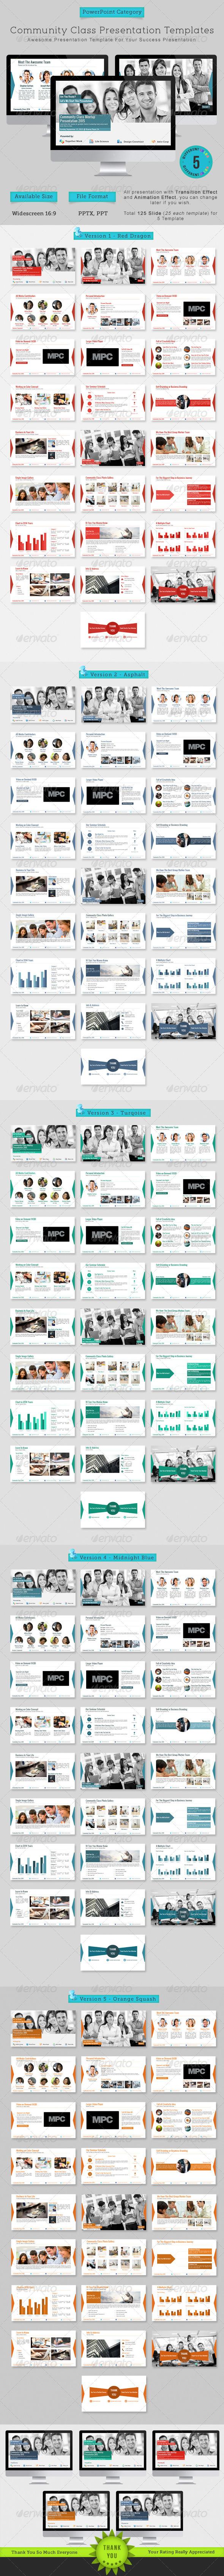 GraphicRiver Community Class Meetup Presentation Templates 6949910